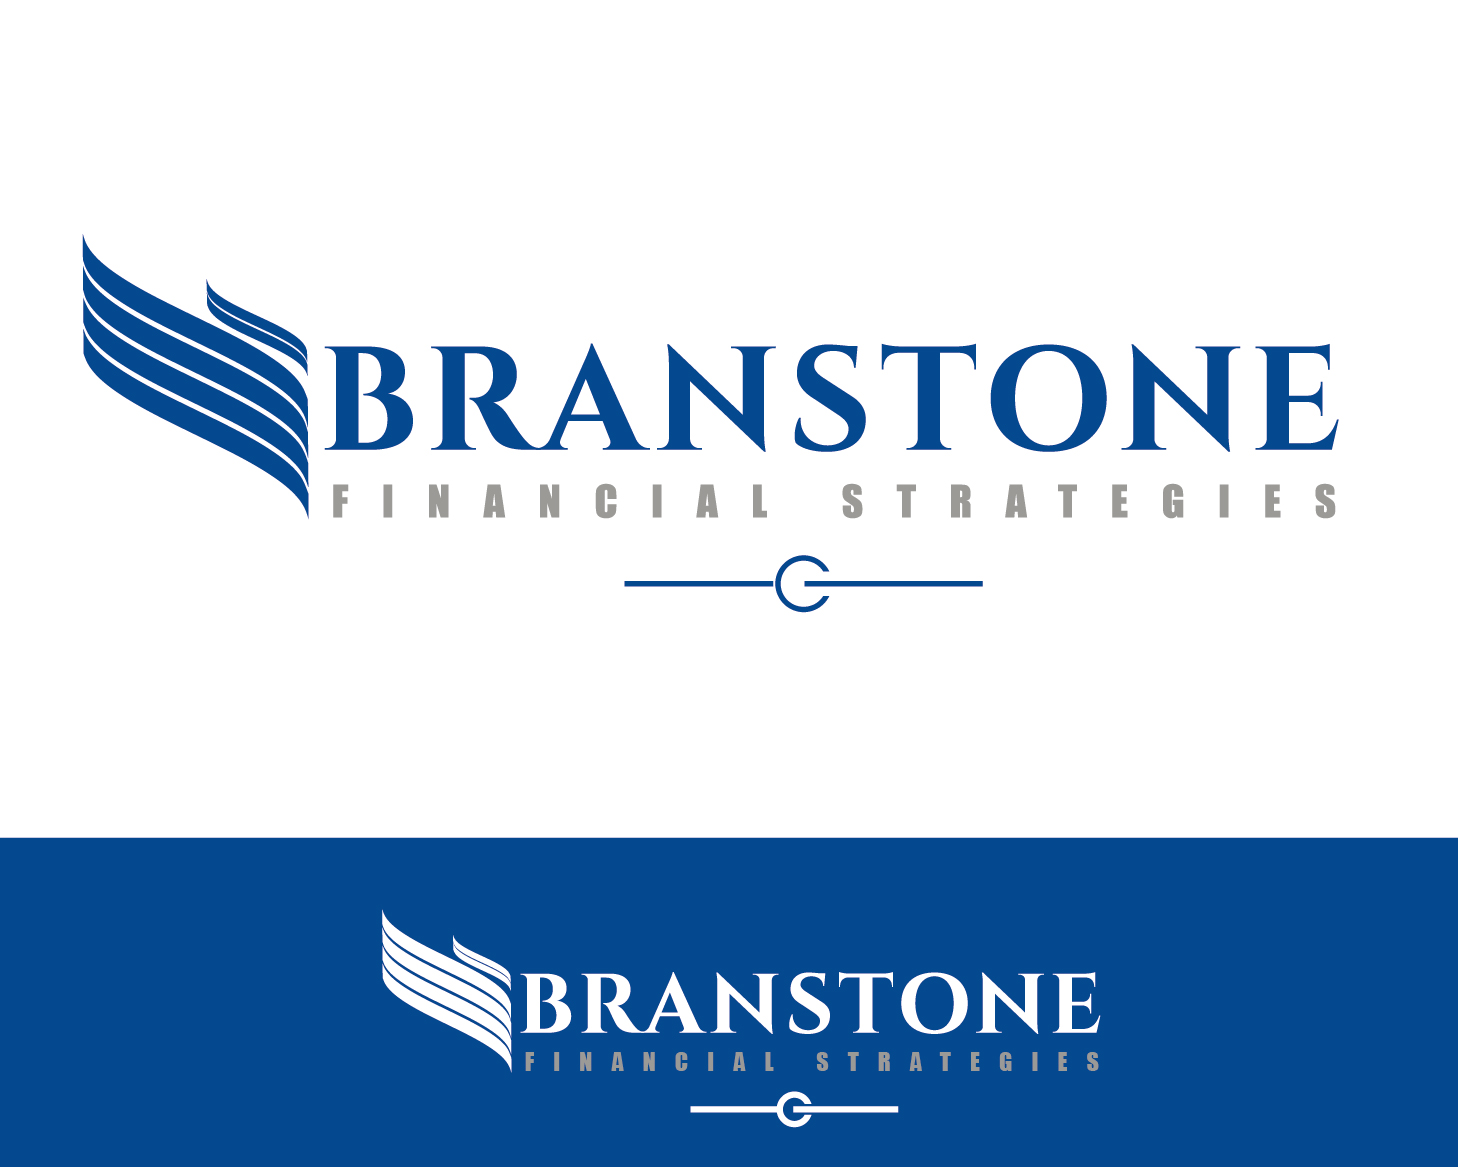 Logo Design by VENTSISLAV KOVACHEV - Entry No. 127 in the Logo Design Contest Inspiring Logo Design for Branstone Financial Strategies.